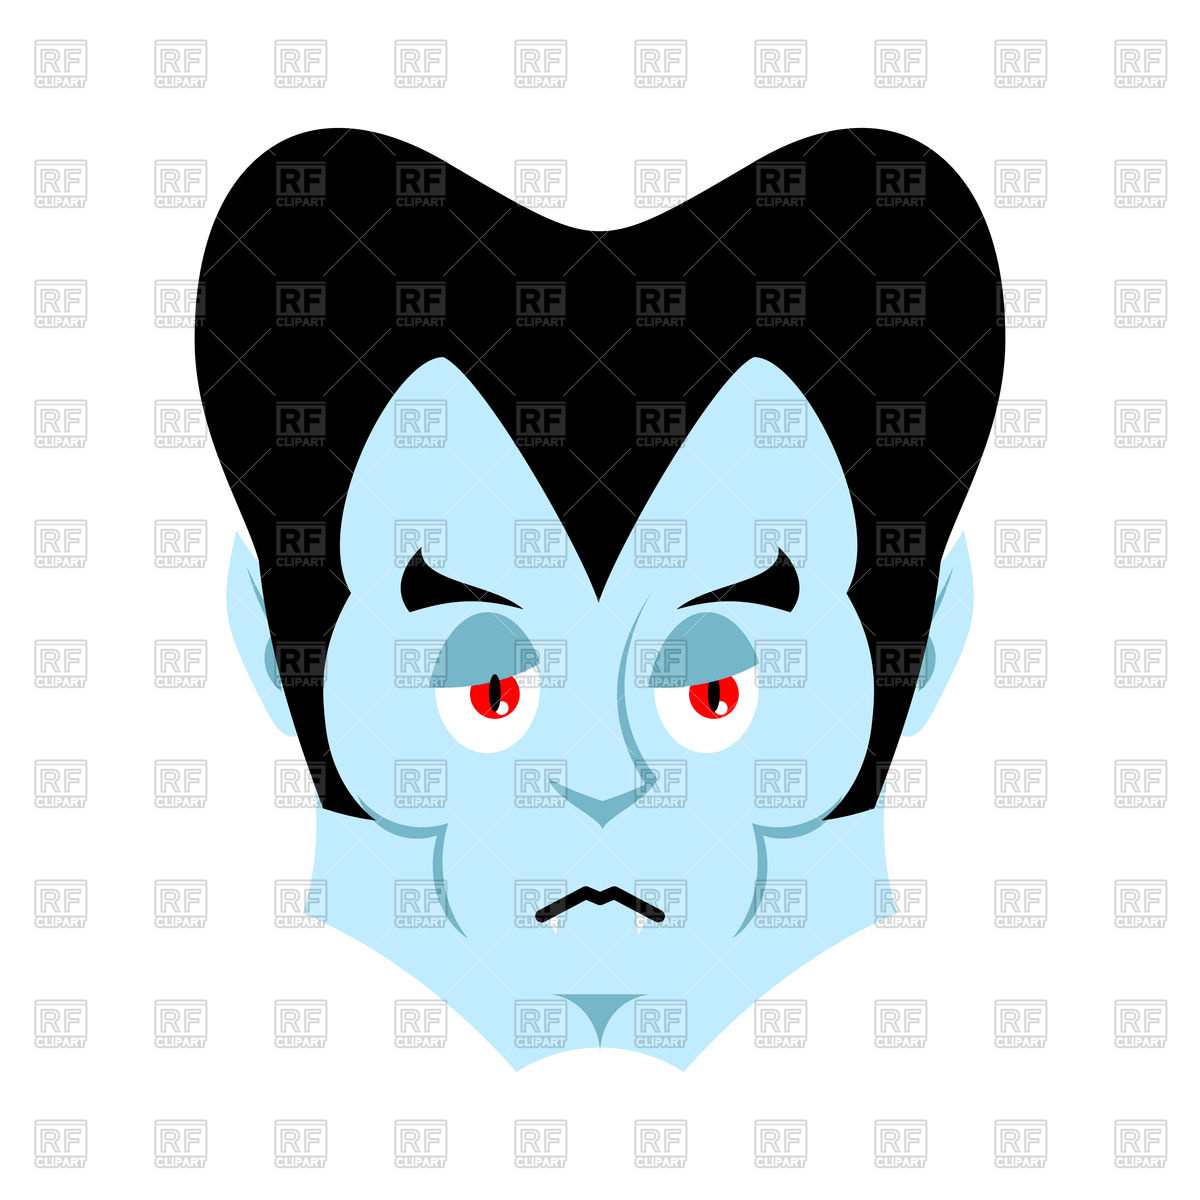 1200x1200 Dracula Sad Emoji. Vampire Sorrowful Emotion Face. Royalty Free